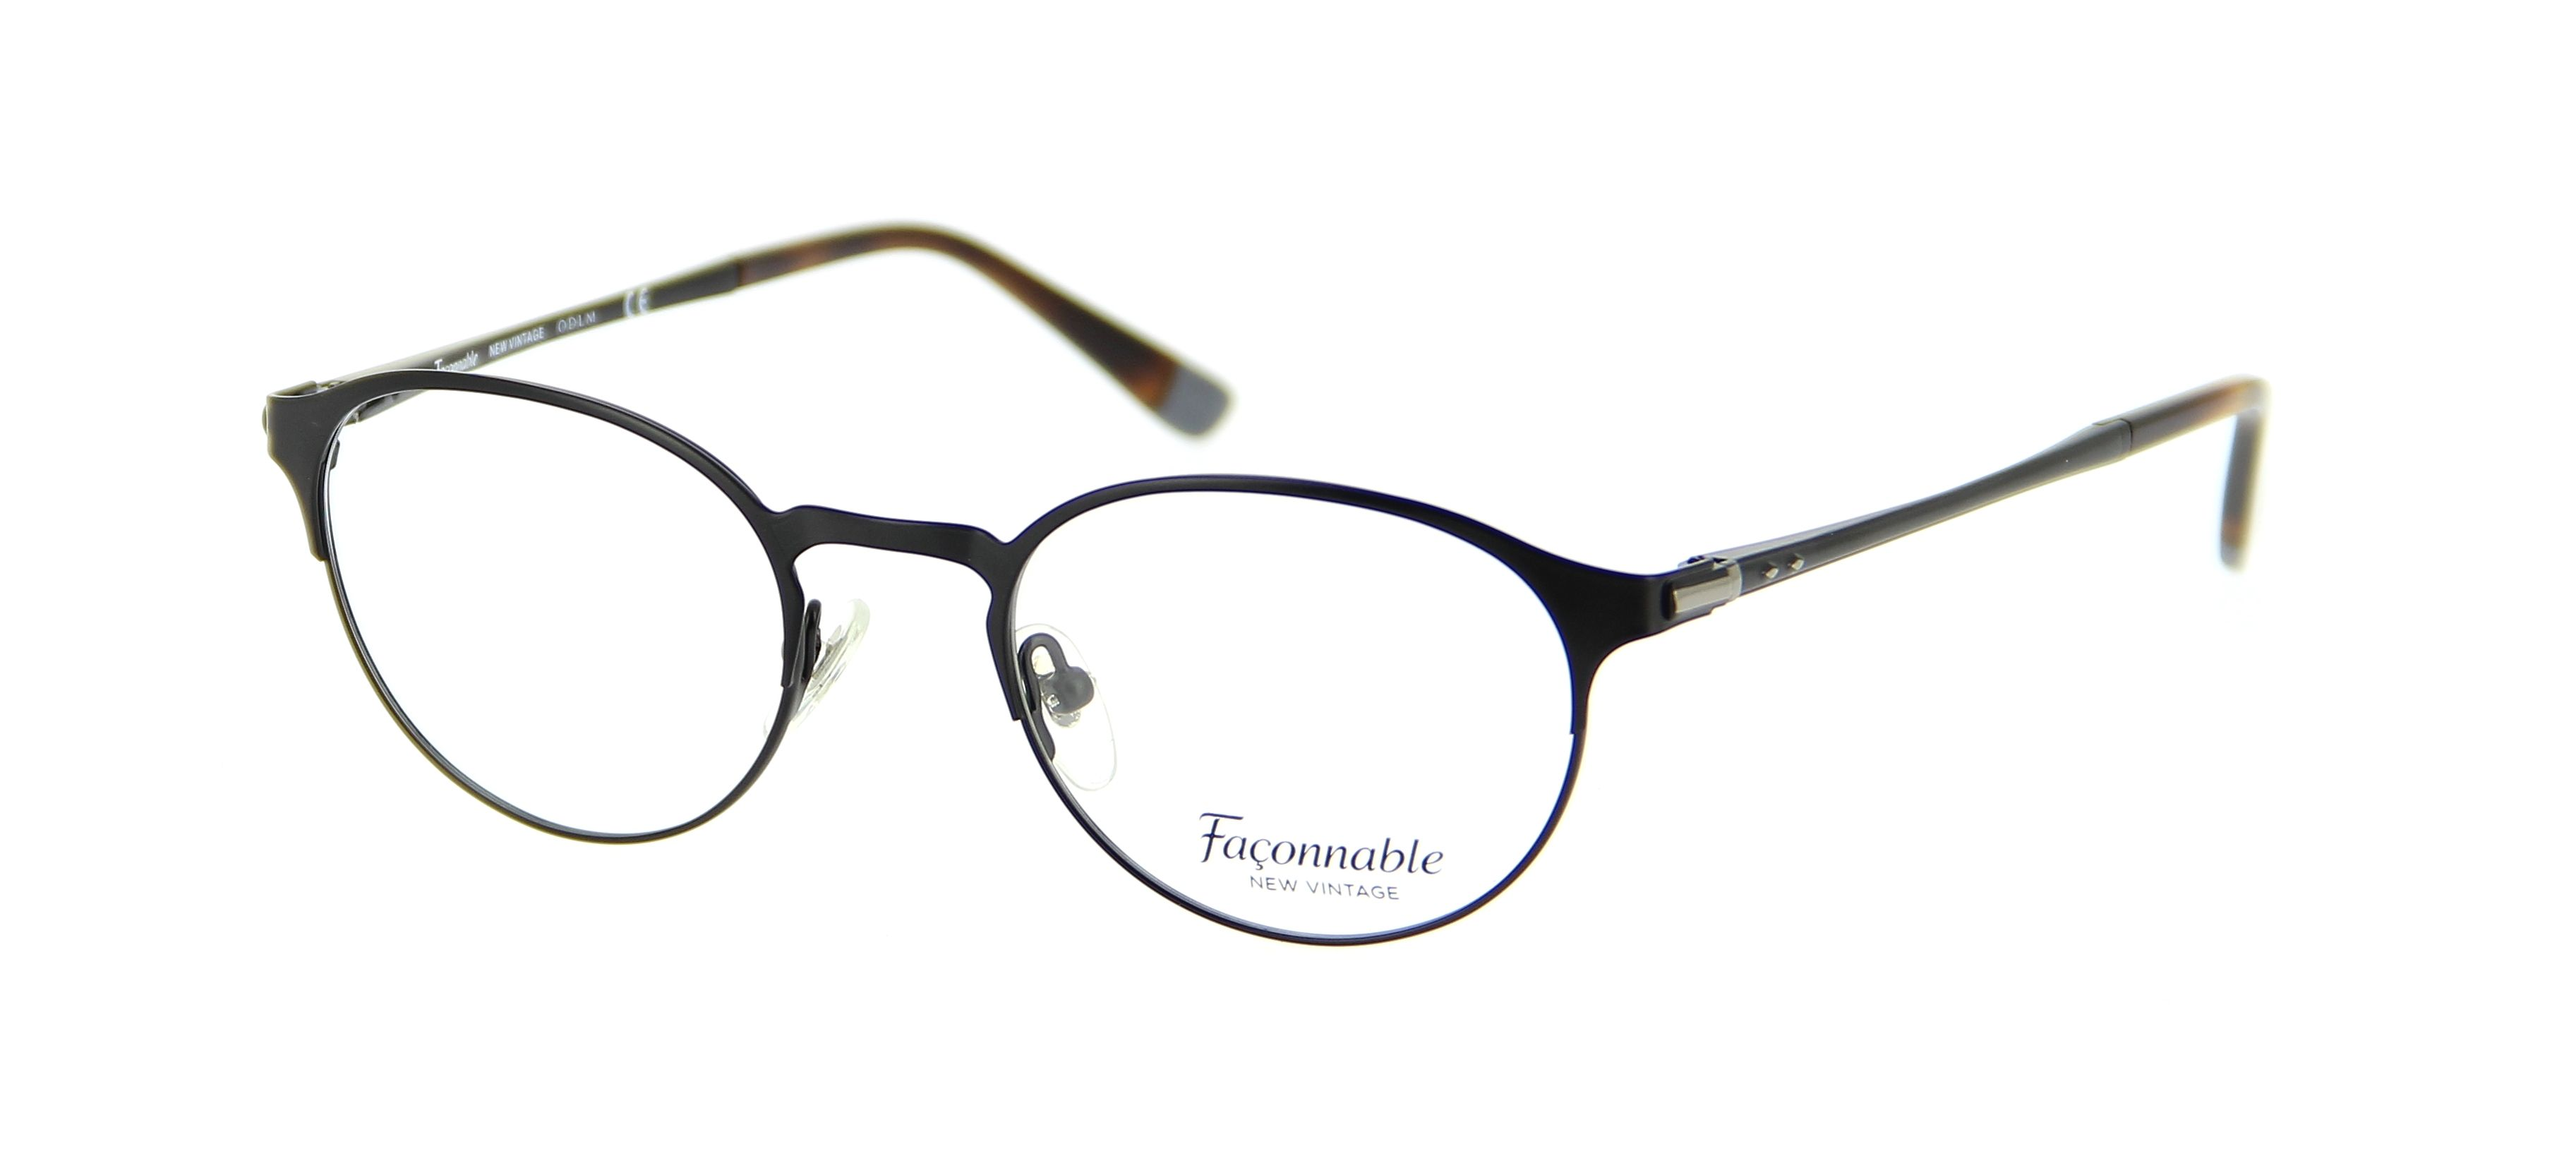 Lunettes de vue 0mmx0mm 0€   Glasses   Eyewear, Glasses, Tags ac1fb3b89ae8